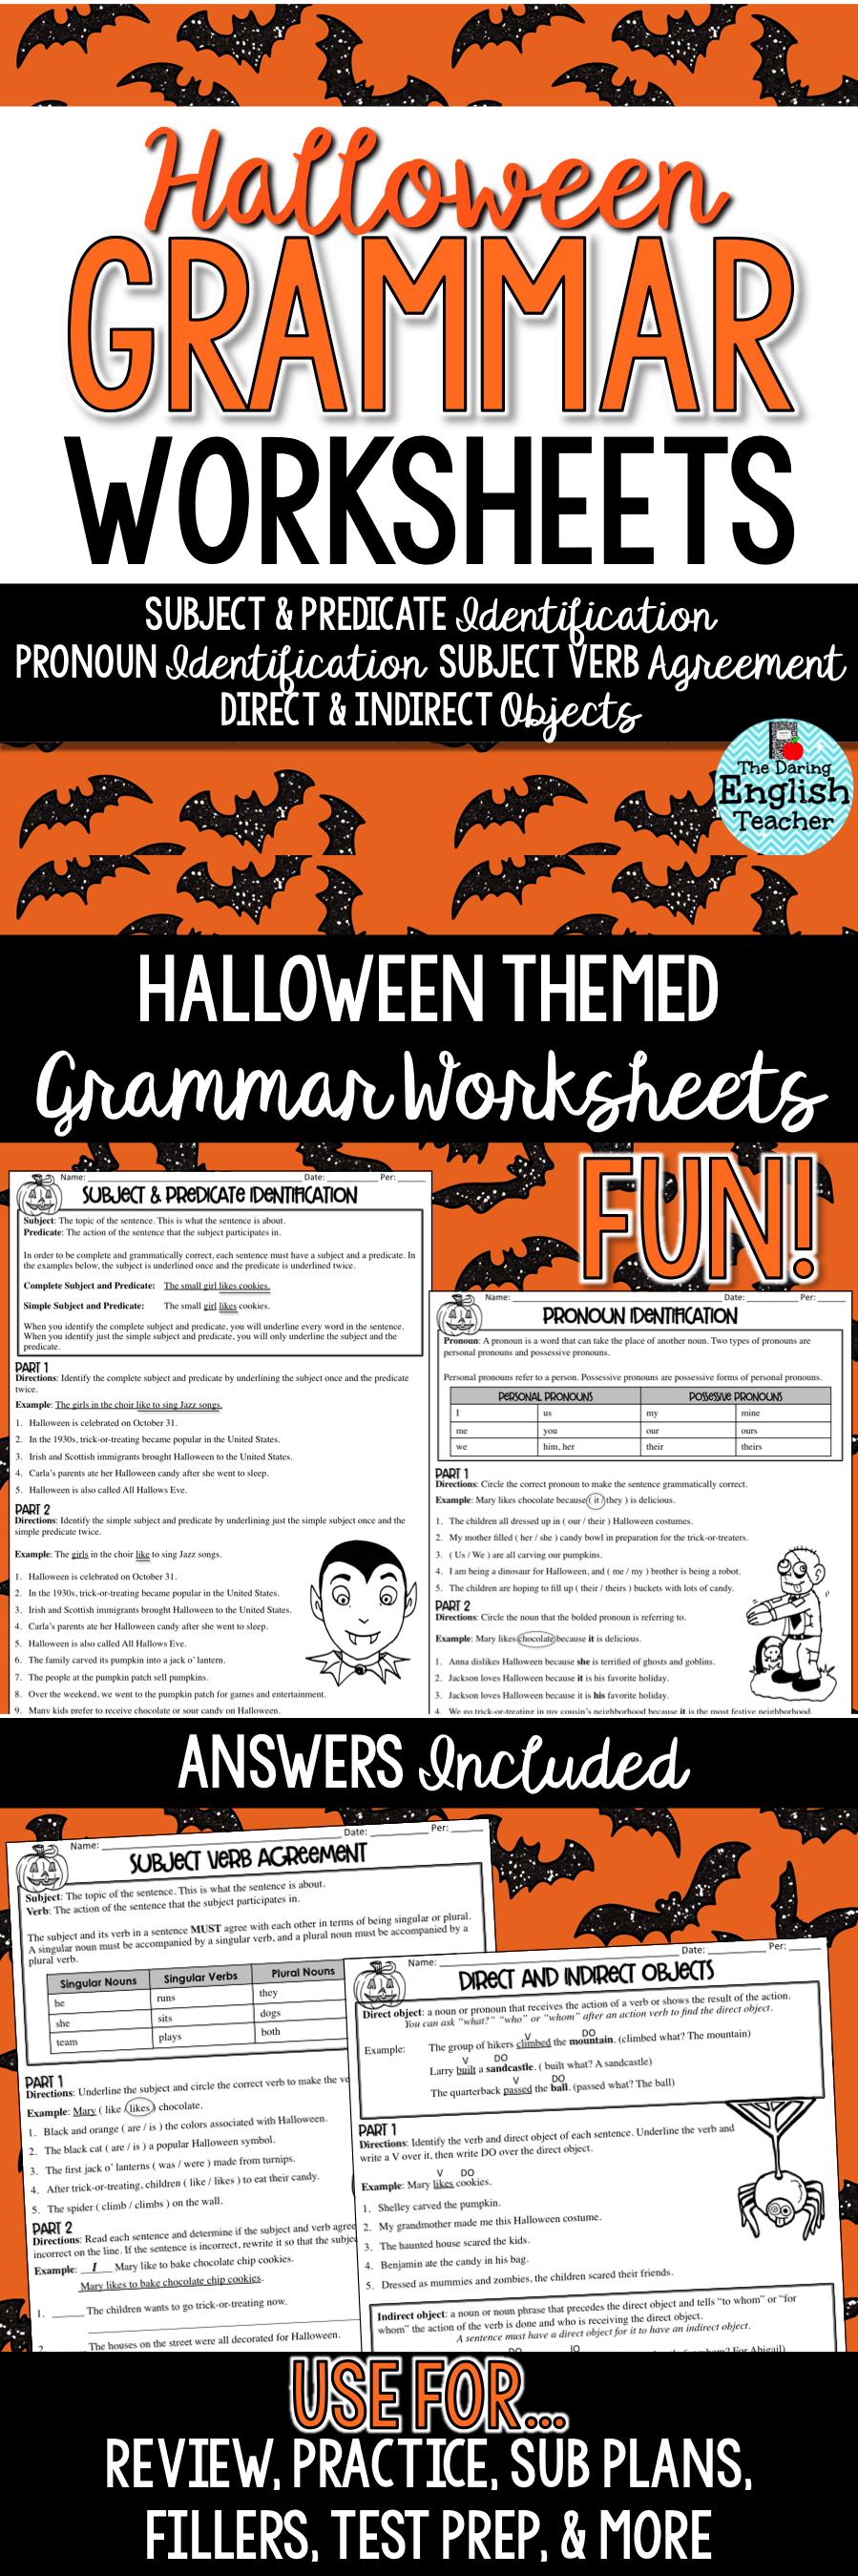 Halloween Grammar Worksheets – Grammar Worksheet High School